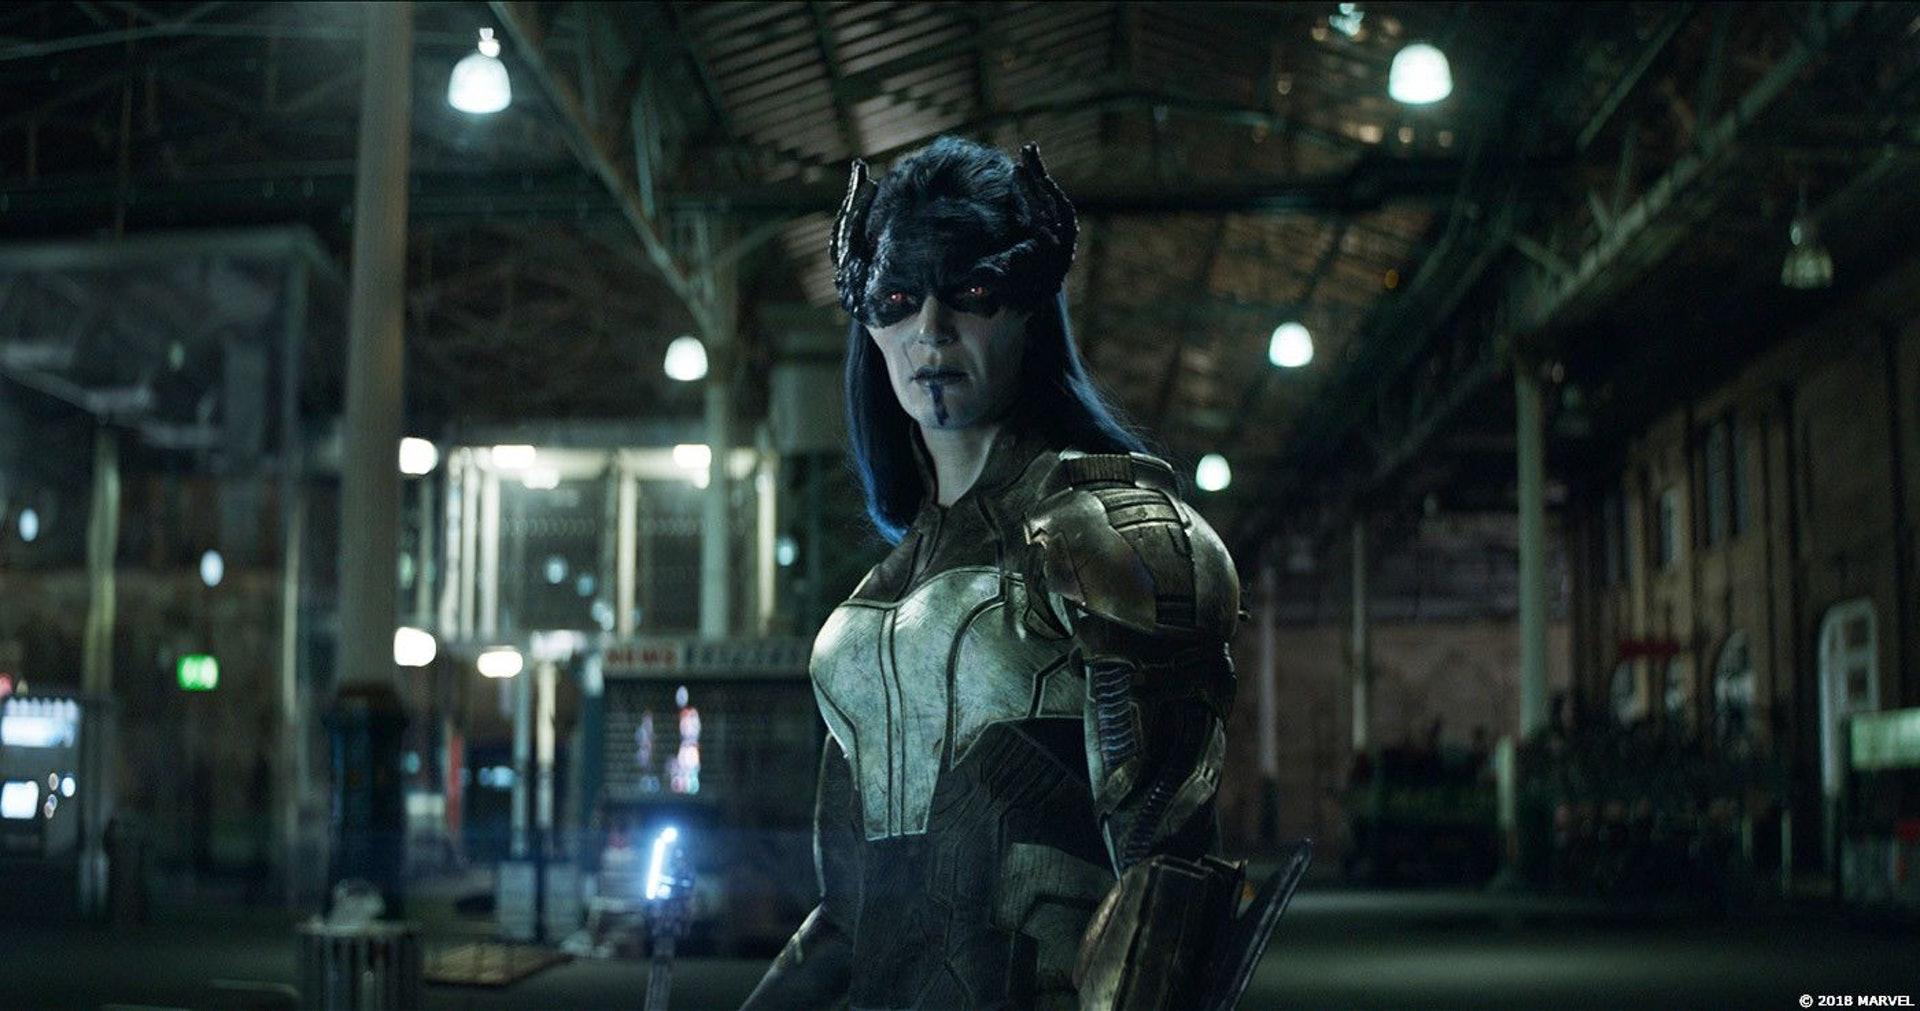 Monique Ganderton在《復仇者聯盟3》中飾演反派Proxima Midnight。(《復仇者聯盟3:無限之戰》劇照)